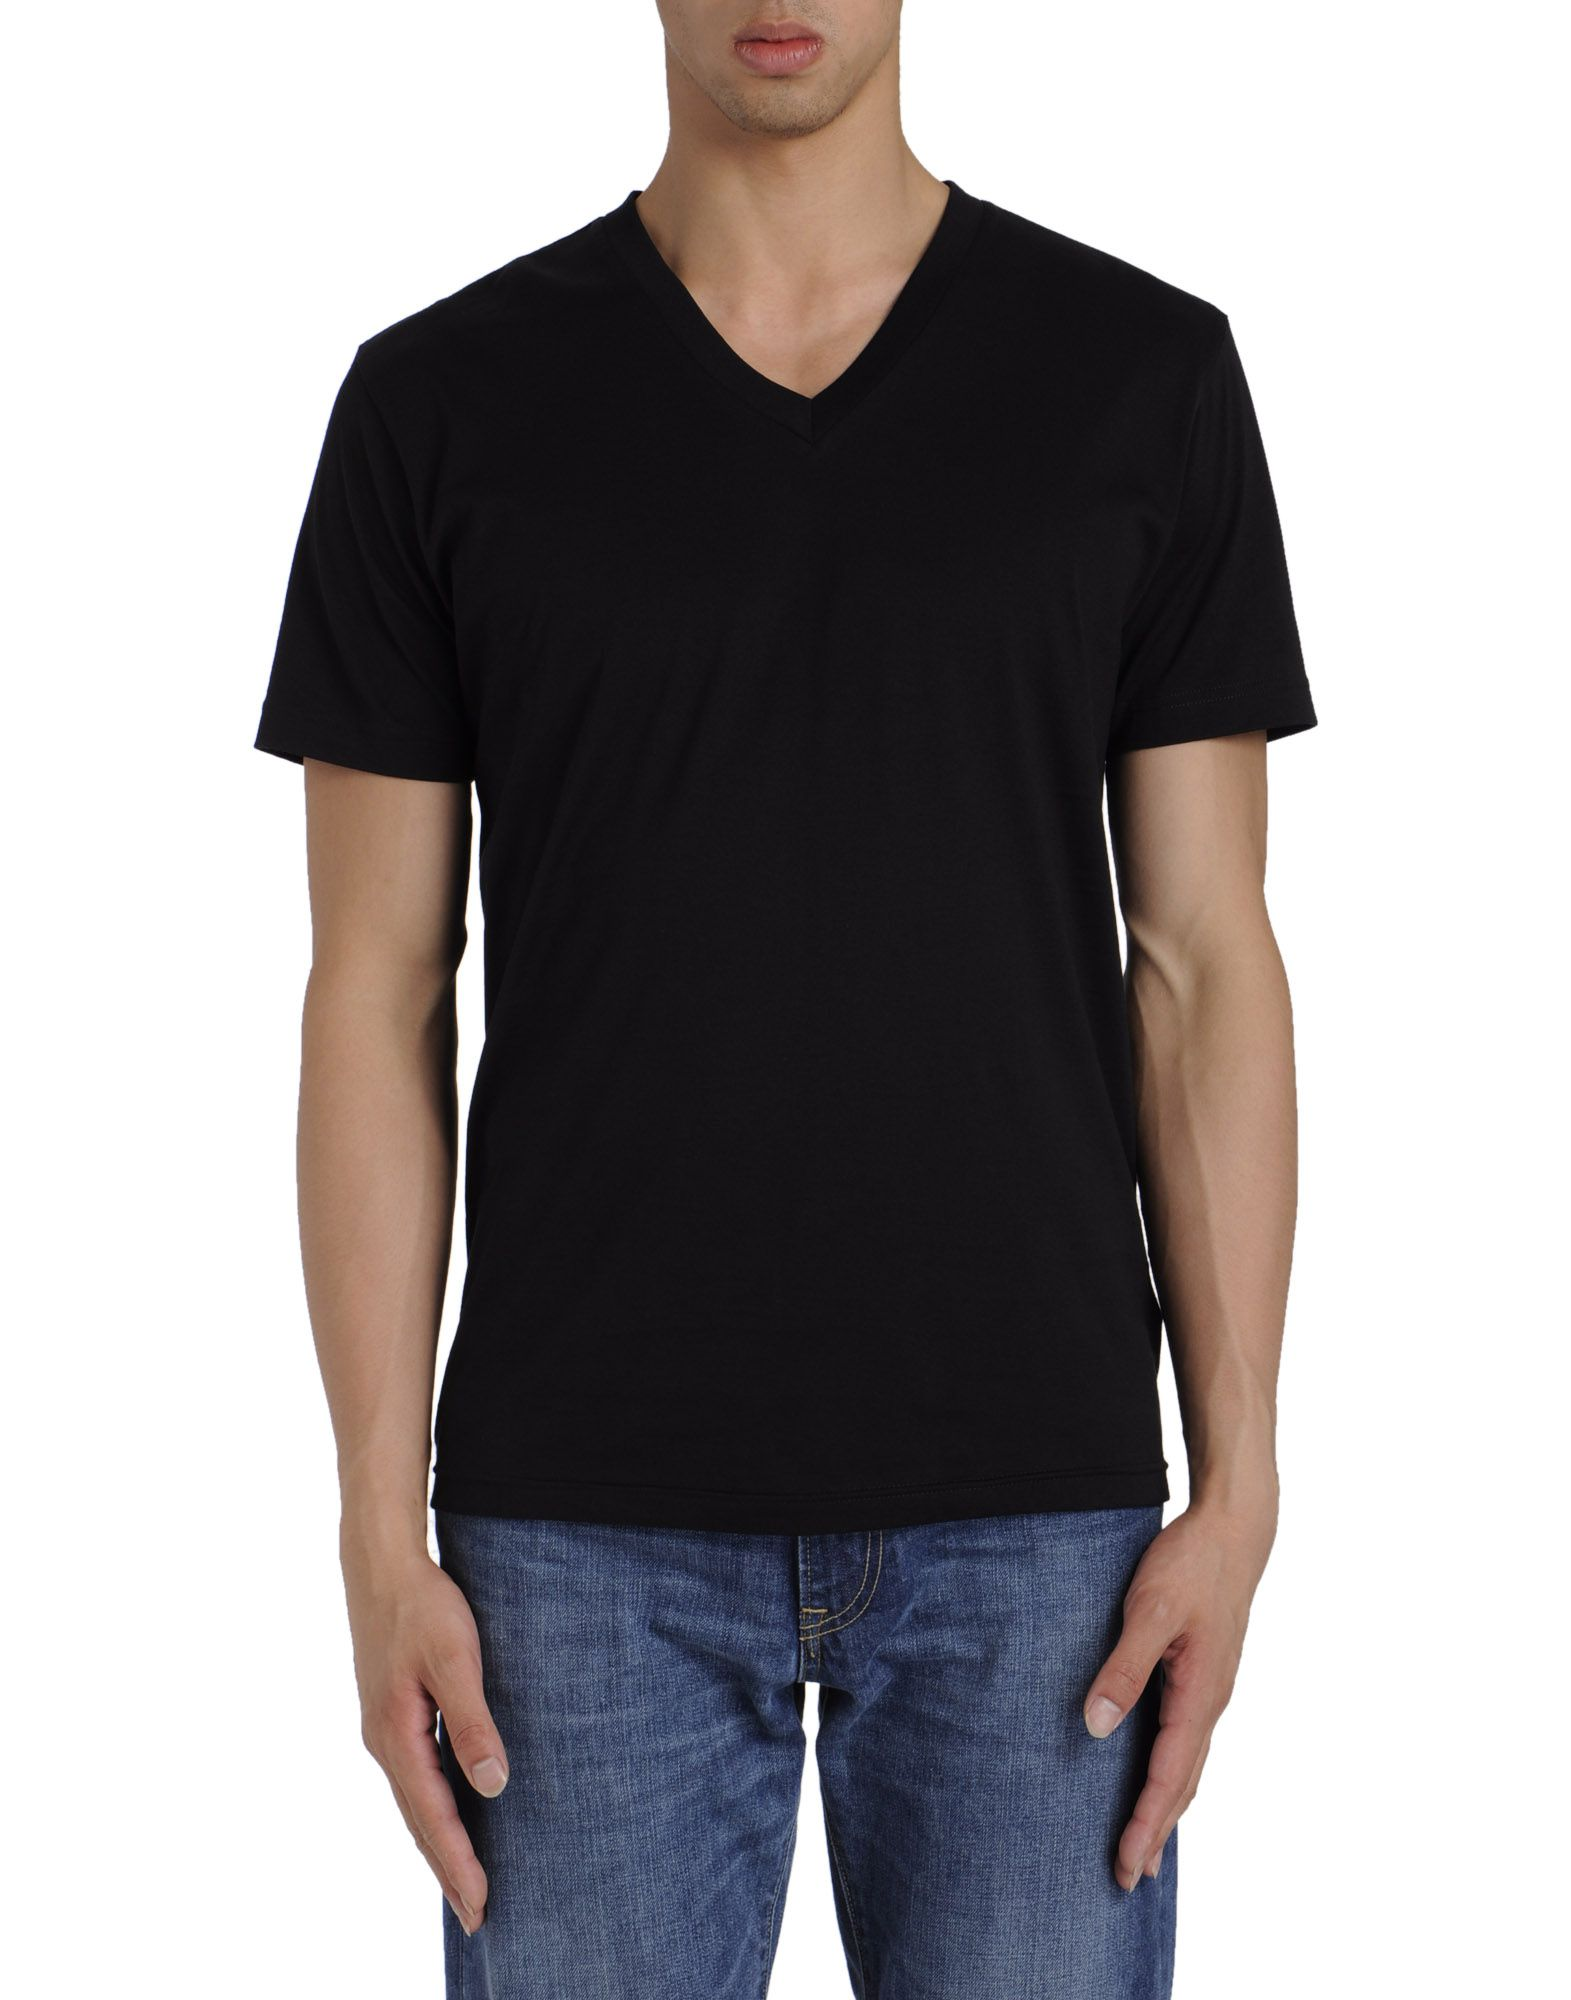 Where To Buy Plain Black T Shirts Bcd Tofu House